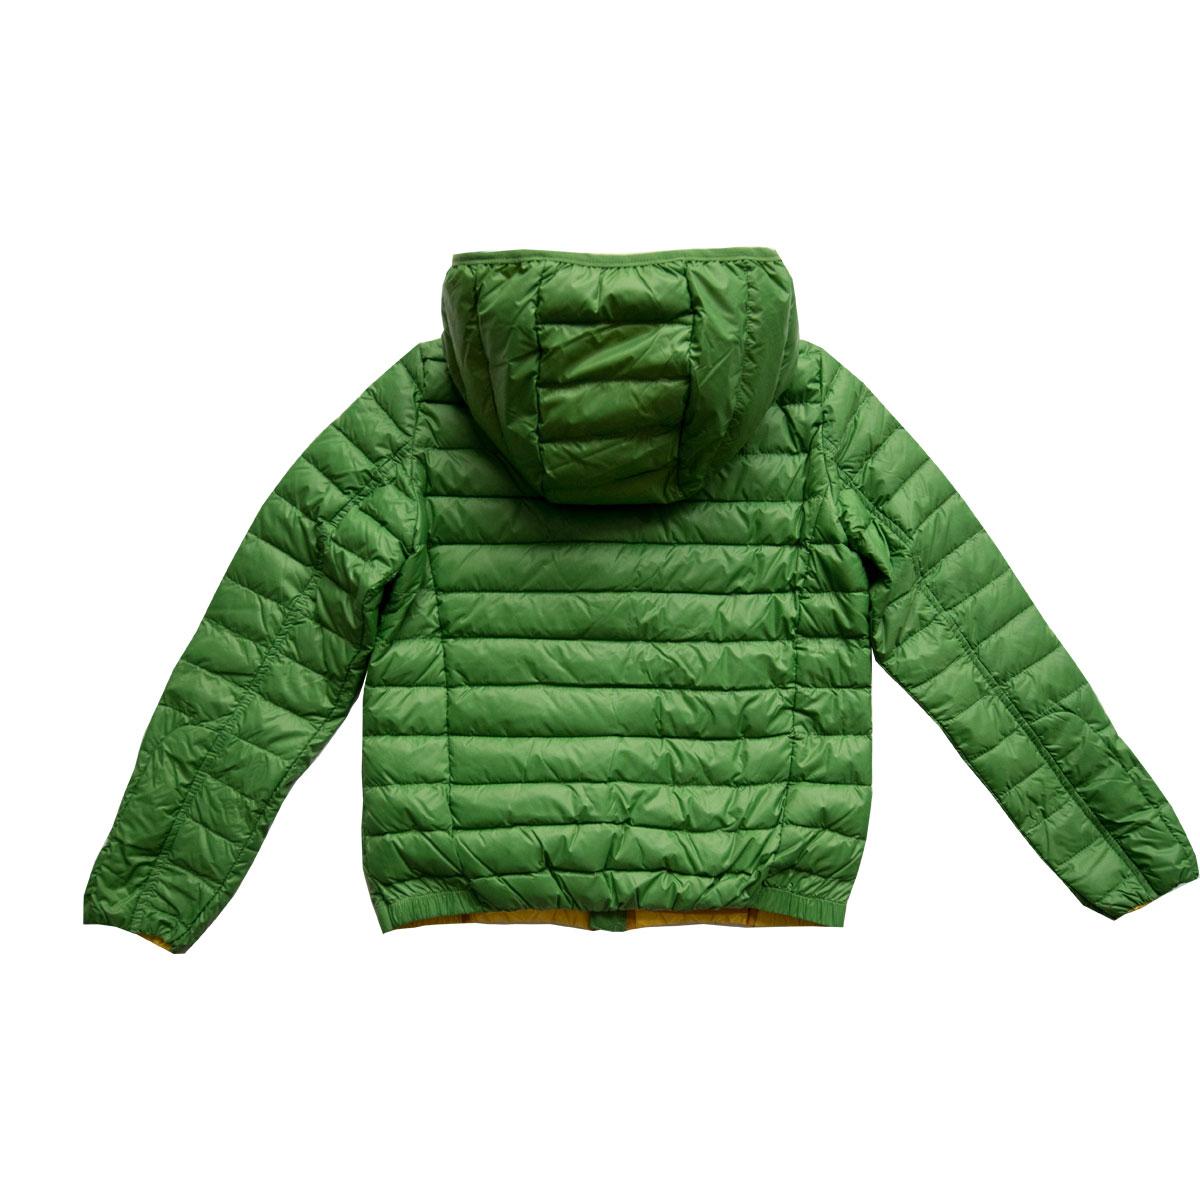 Pengu KIDS kids green ultra light down jacket